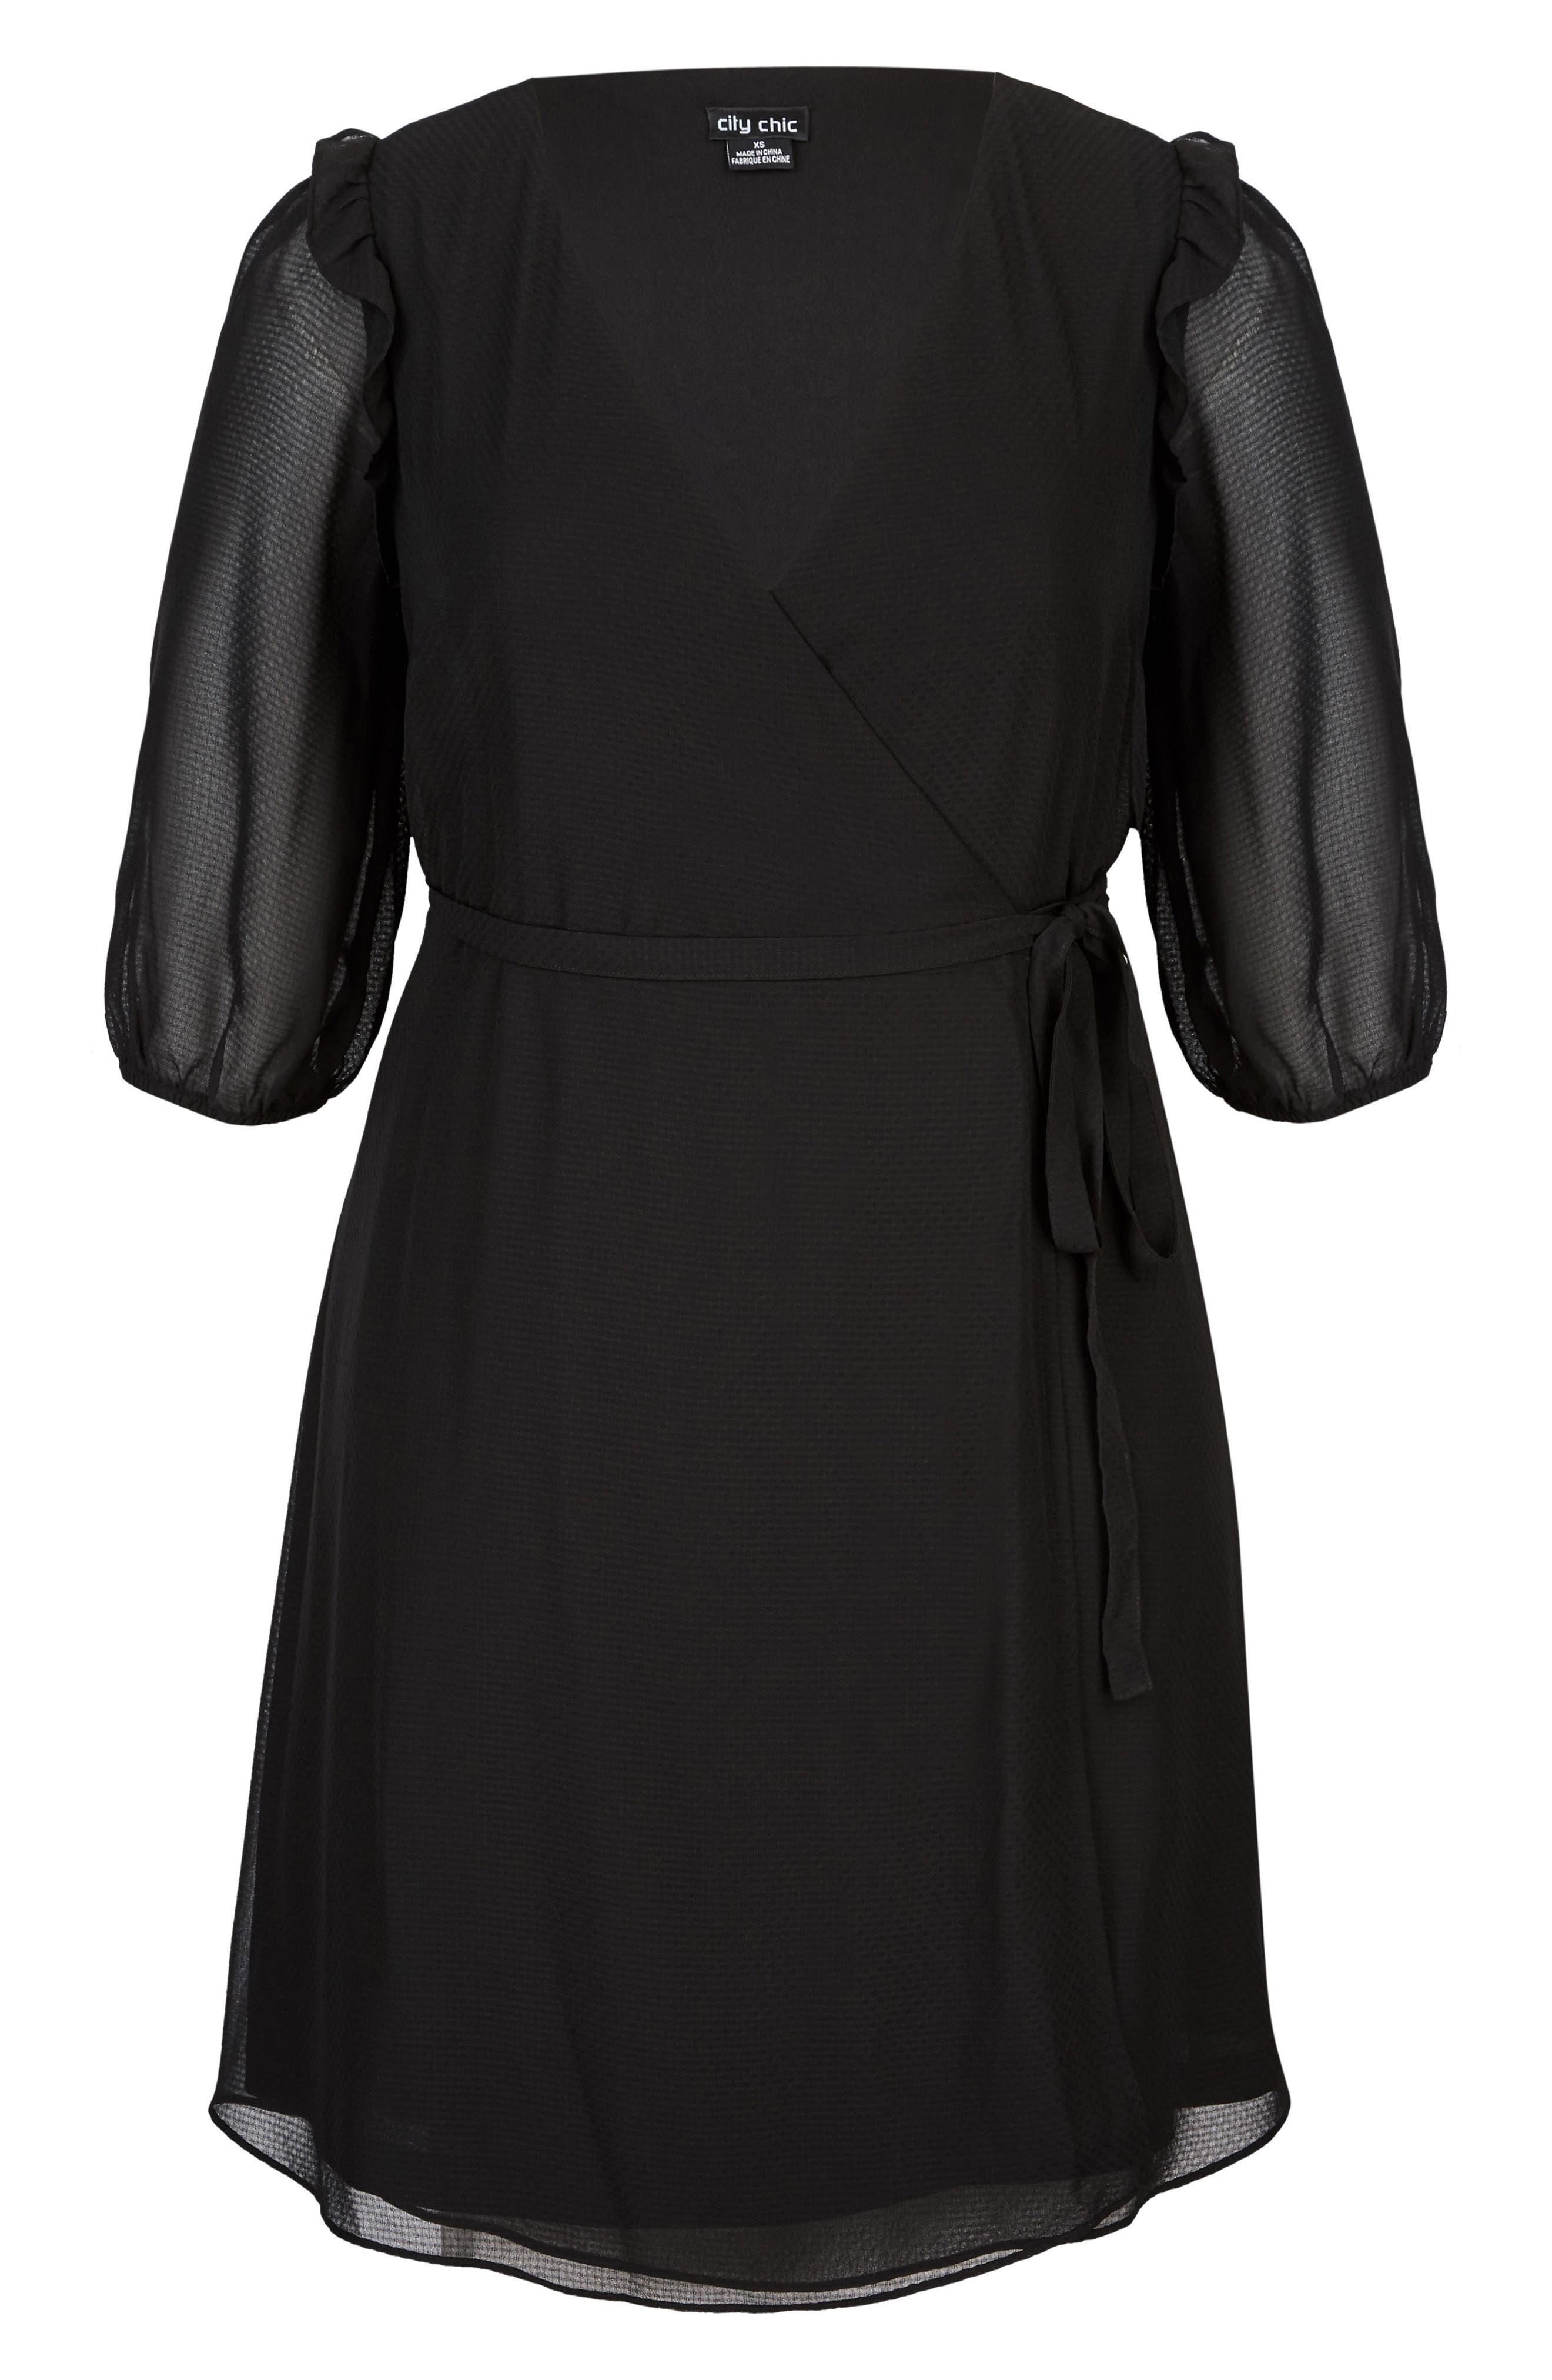 Simply So Wrap Dress,                             Alternate thumbnail 3, color,                             001